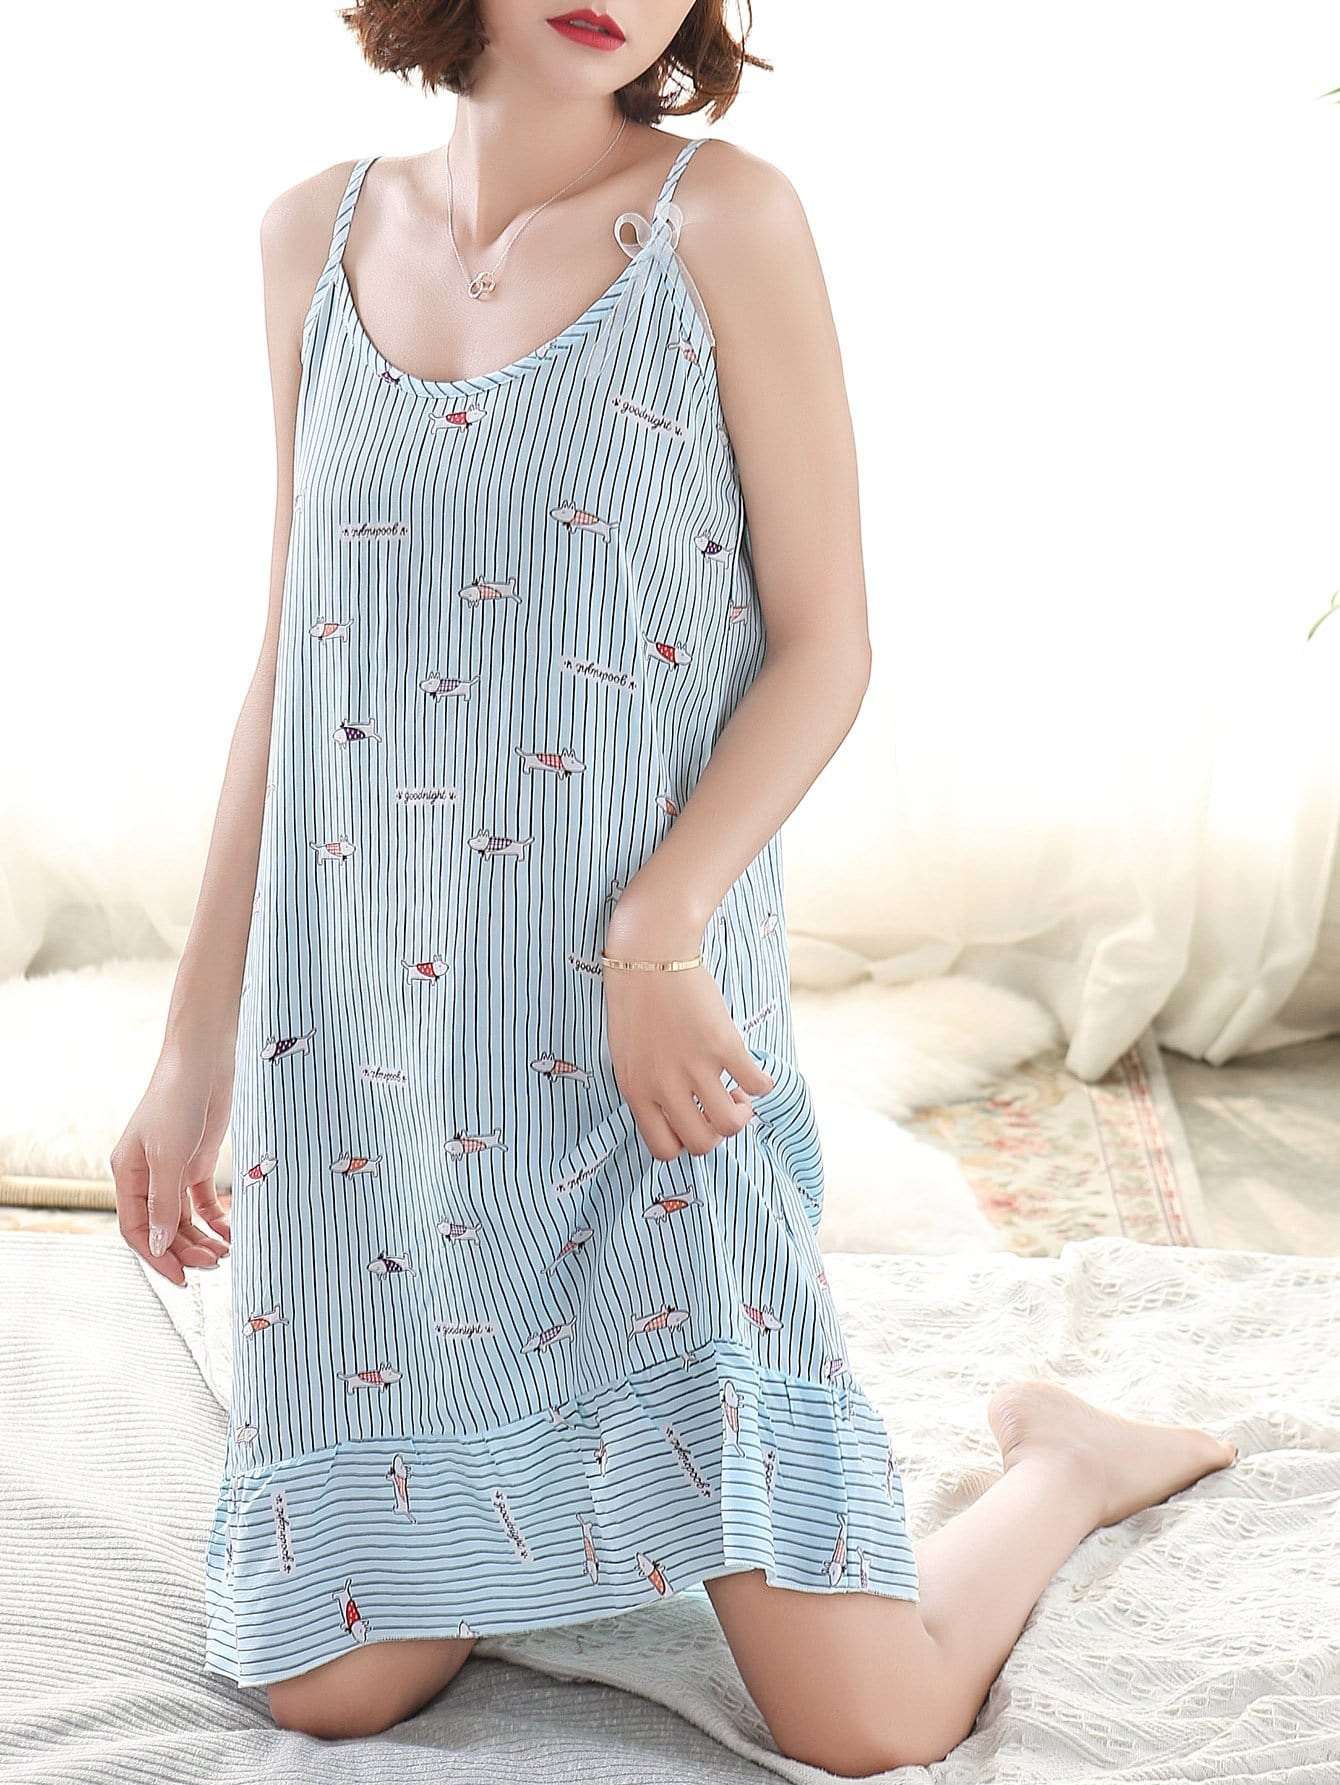 Dog Print Ruffle Hem Striped Cami Dress dog print ruffle hem night dress